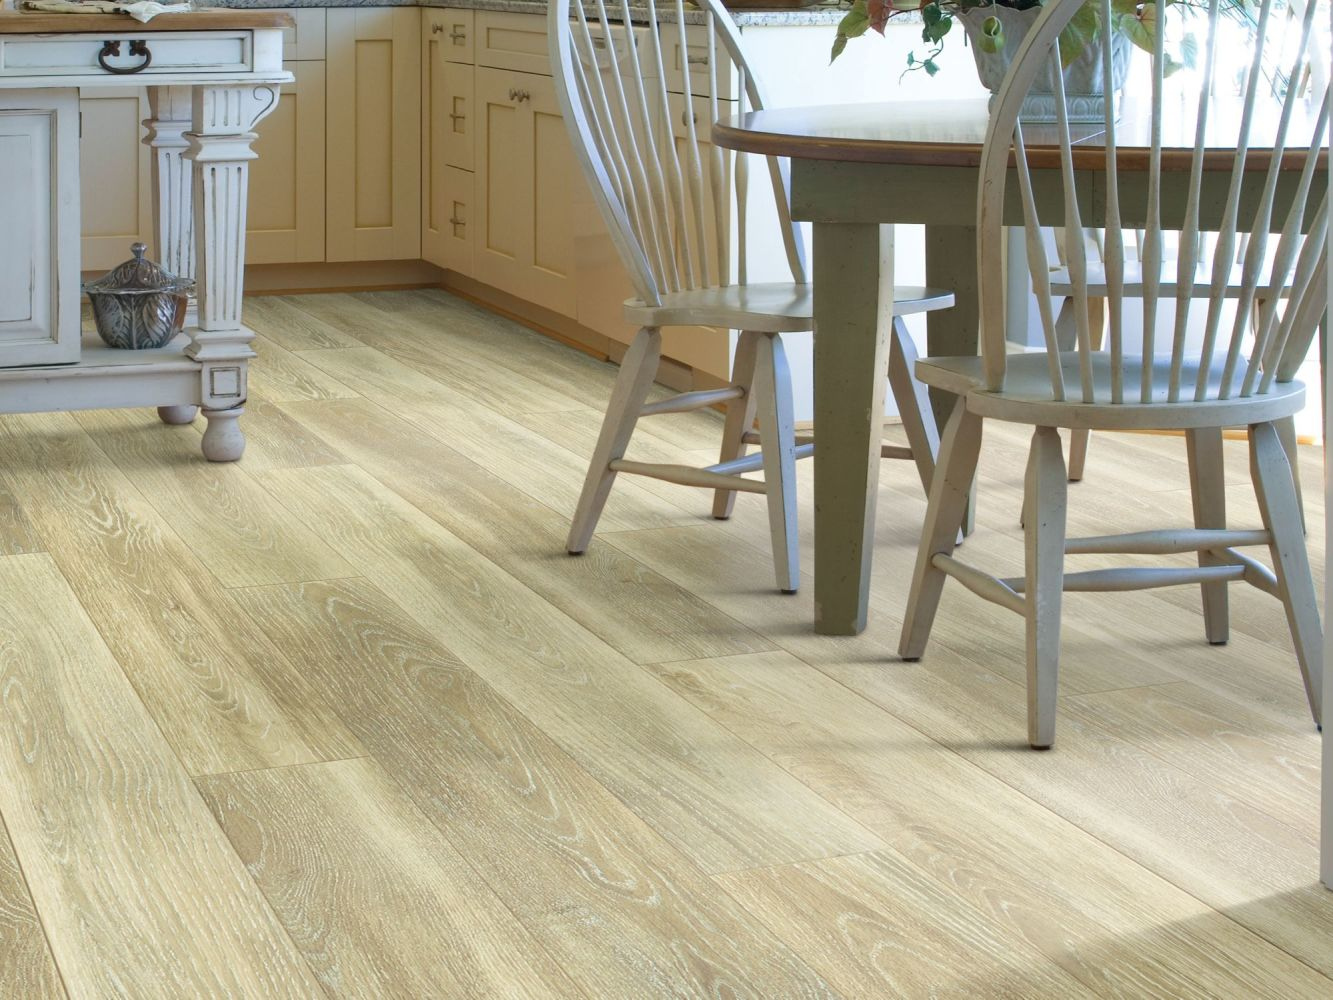 Shaw Floors Resilient Residential Tivoli Plus Vieste 00268_0845V